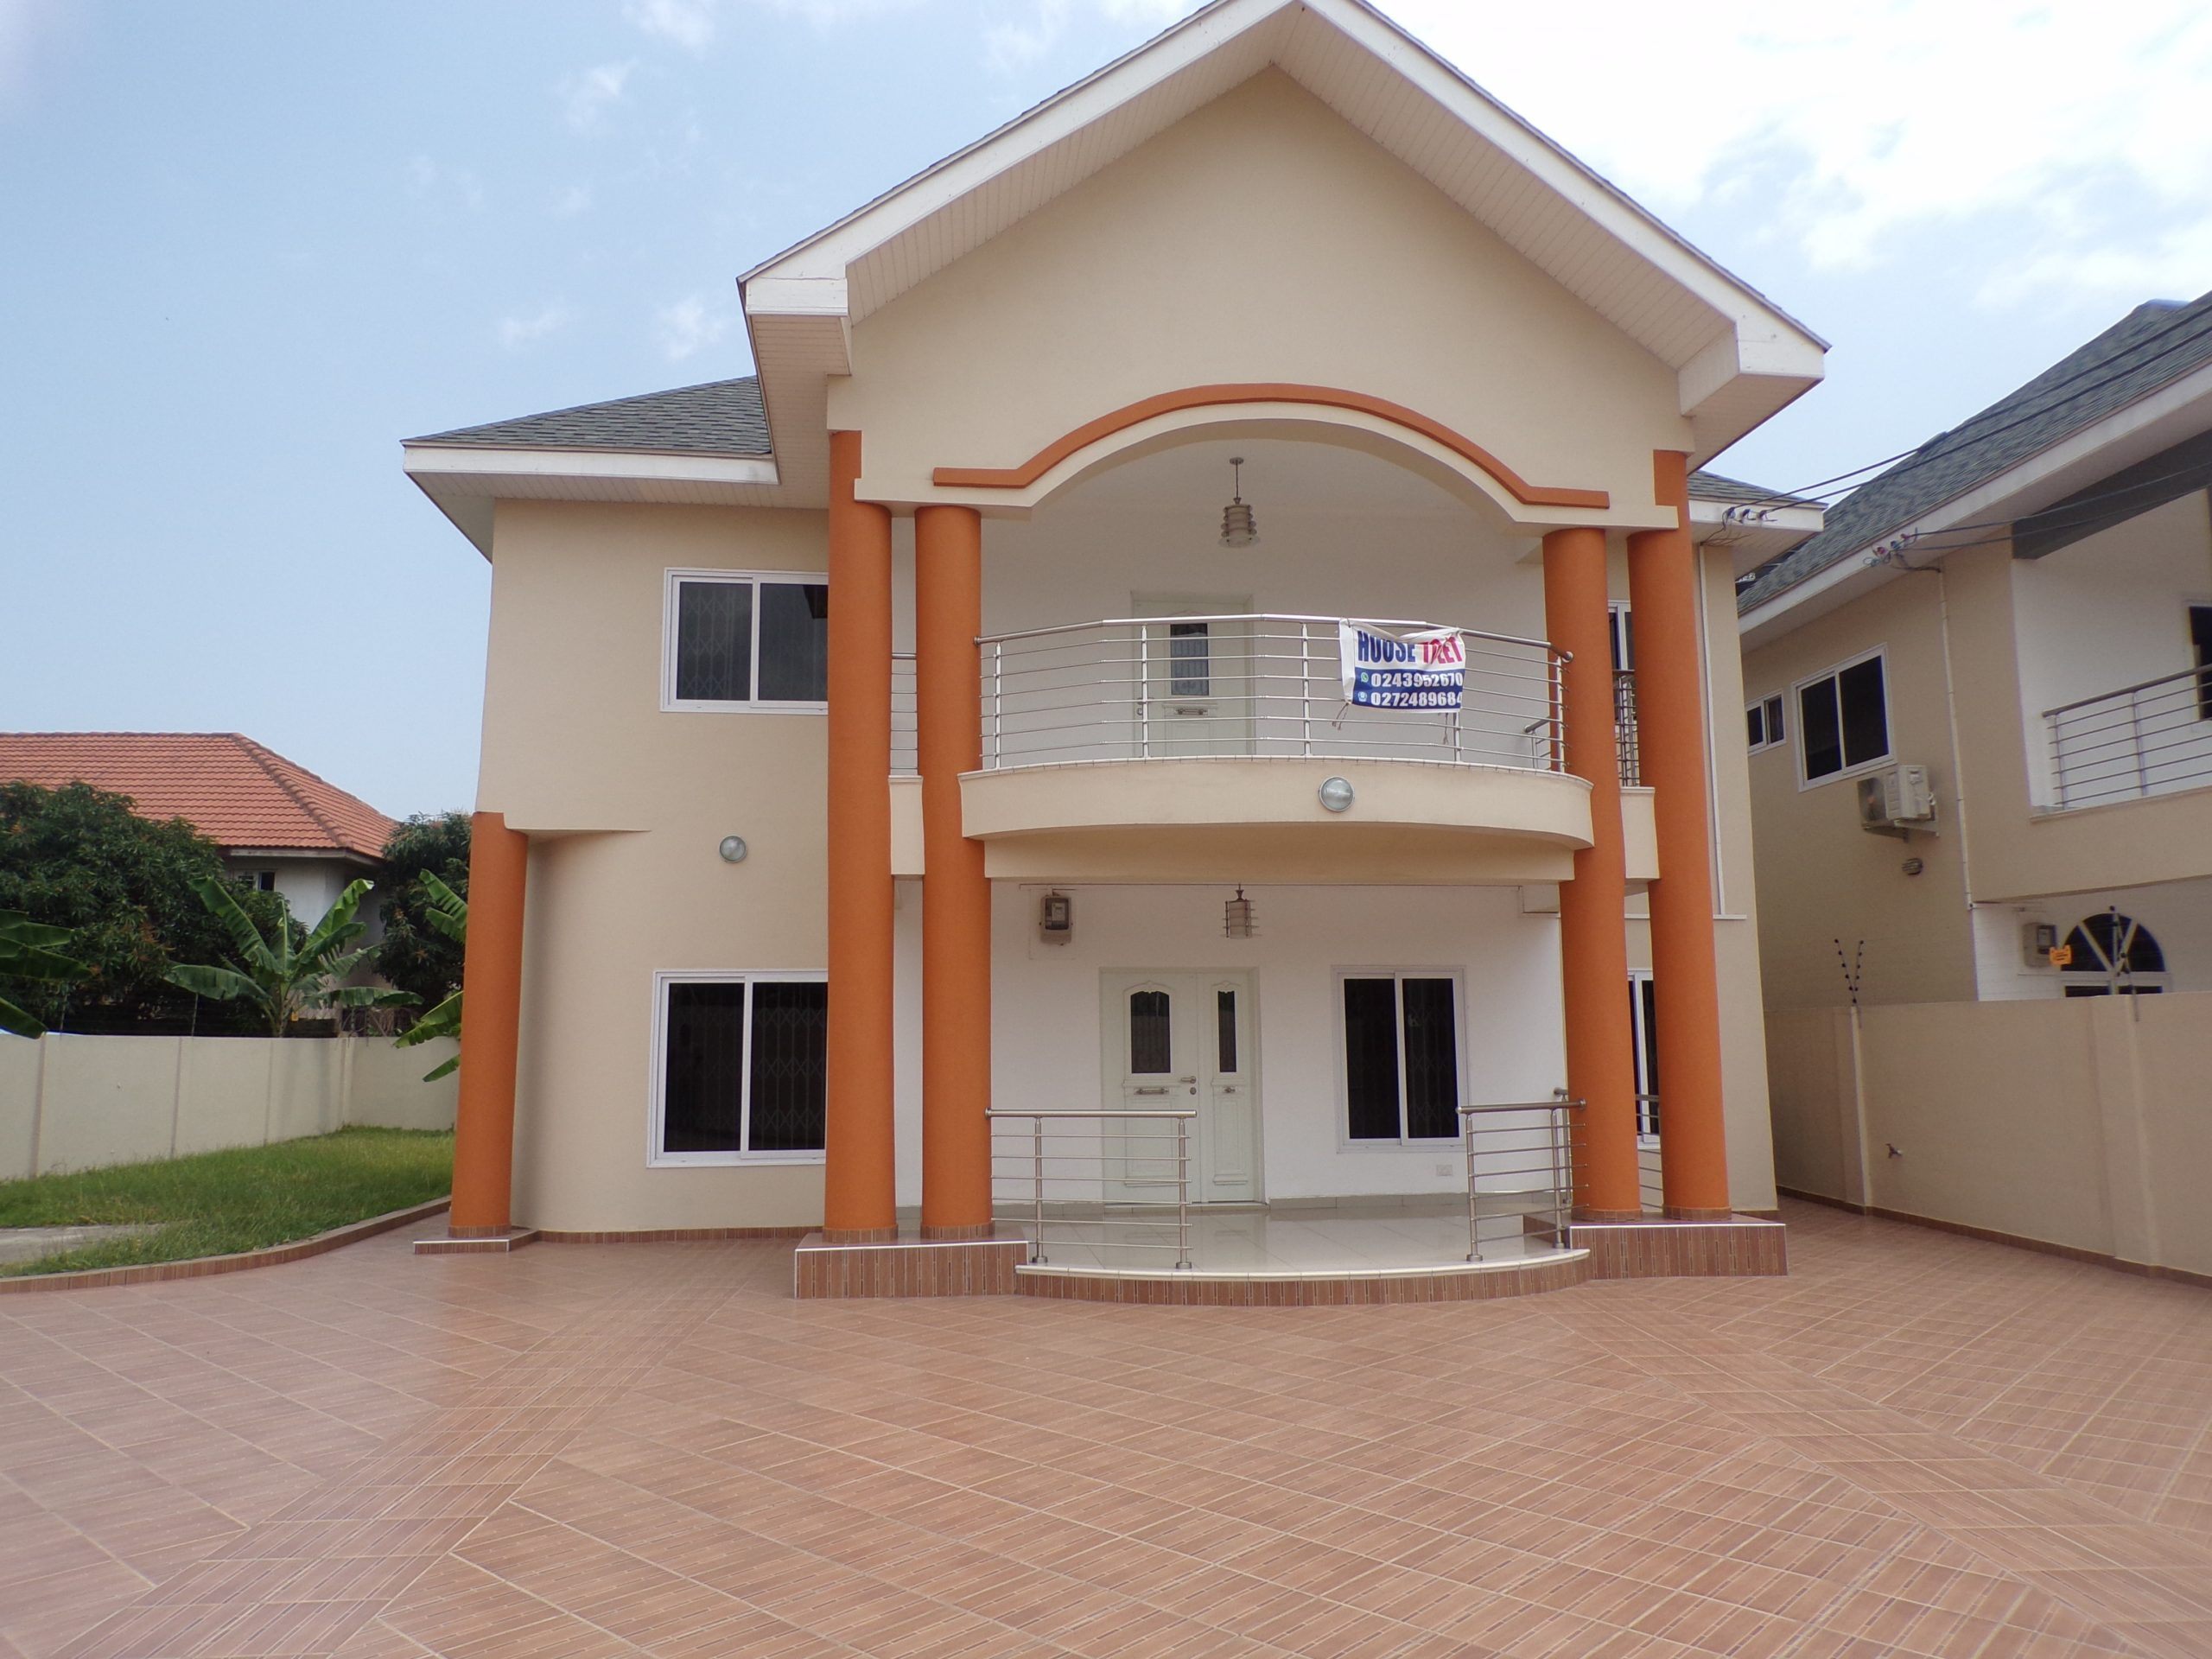 4 bedroom House for Rent in Adjiringanor